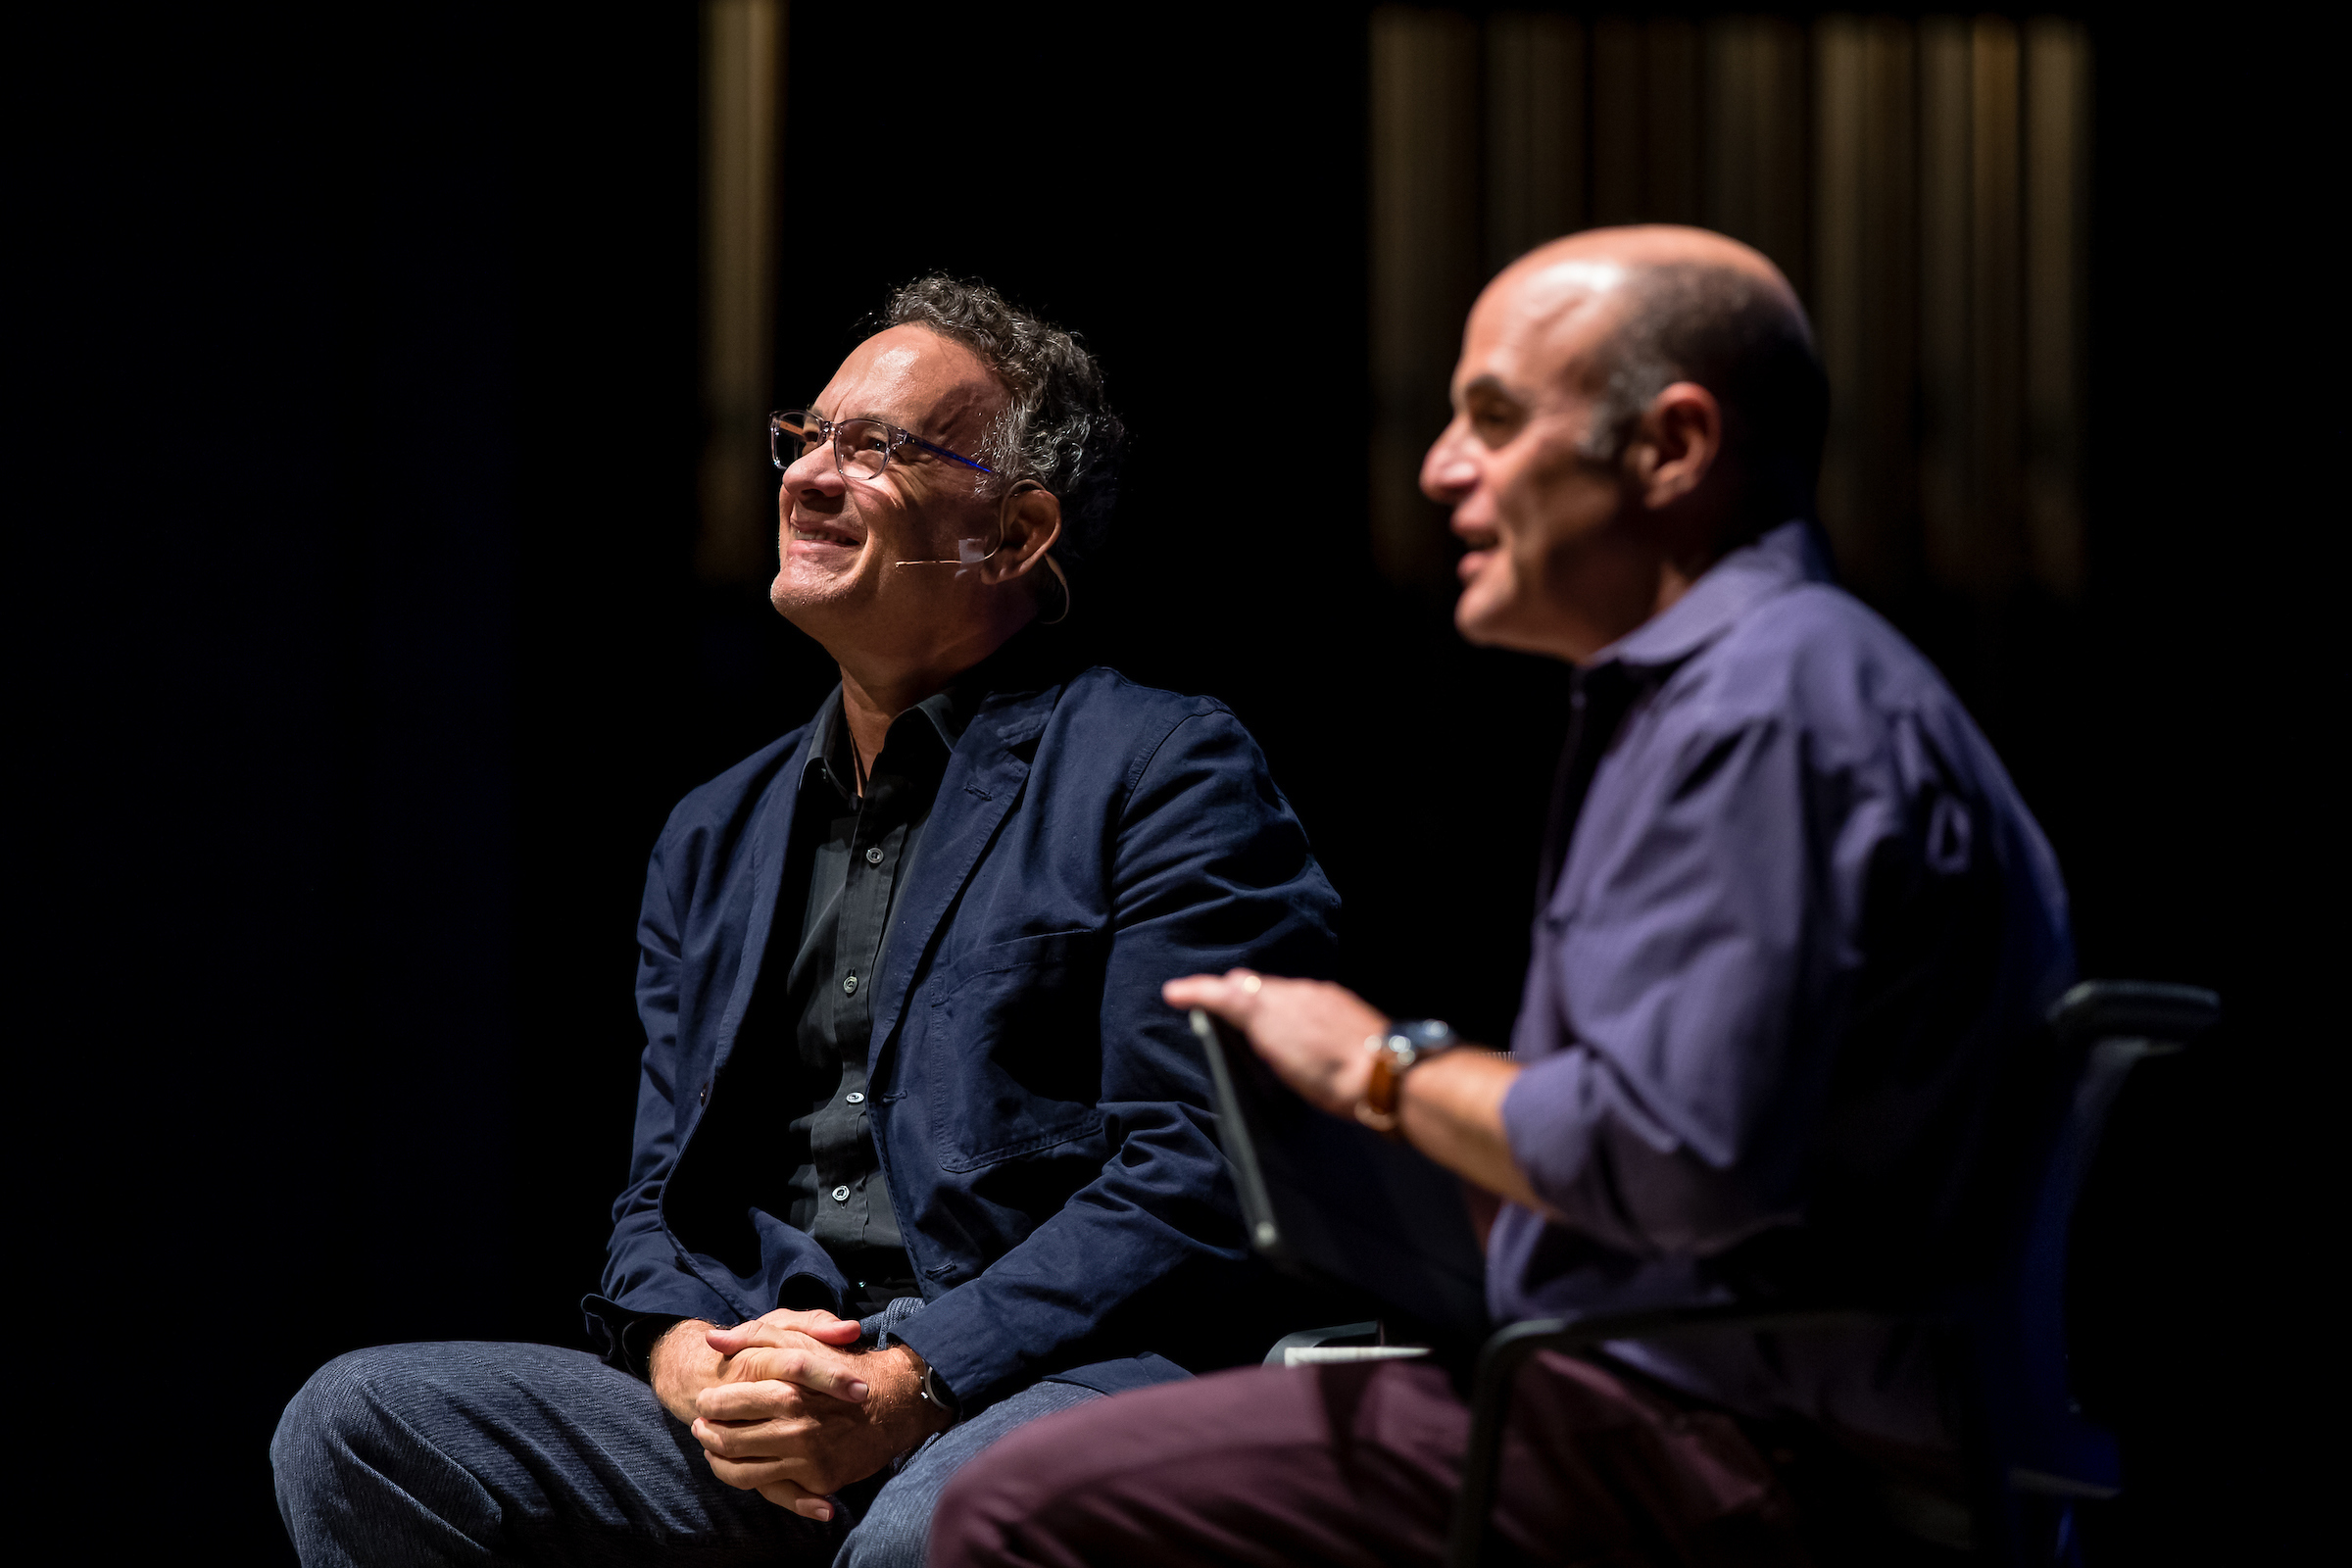 Hanks and Sagal, admiring the simultaneous transcription